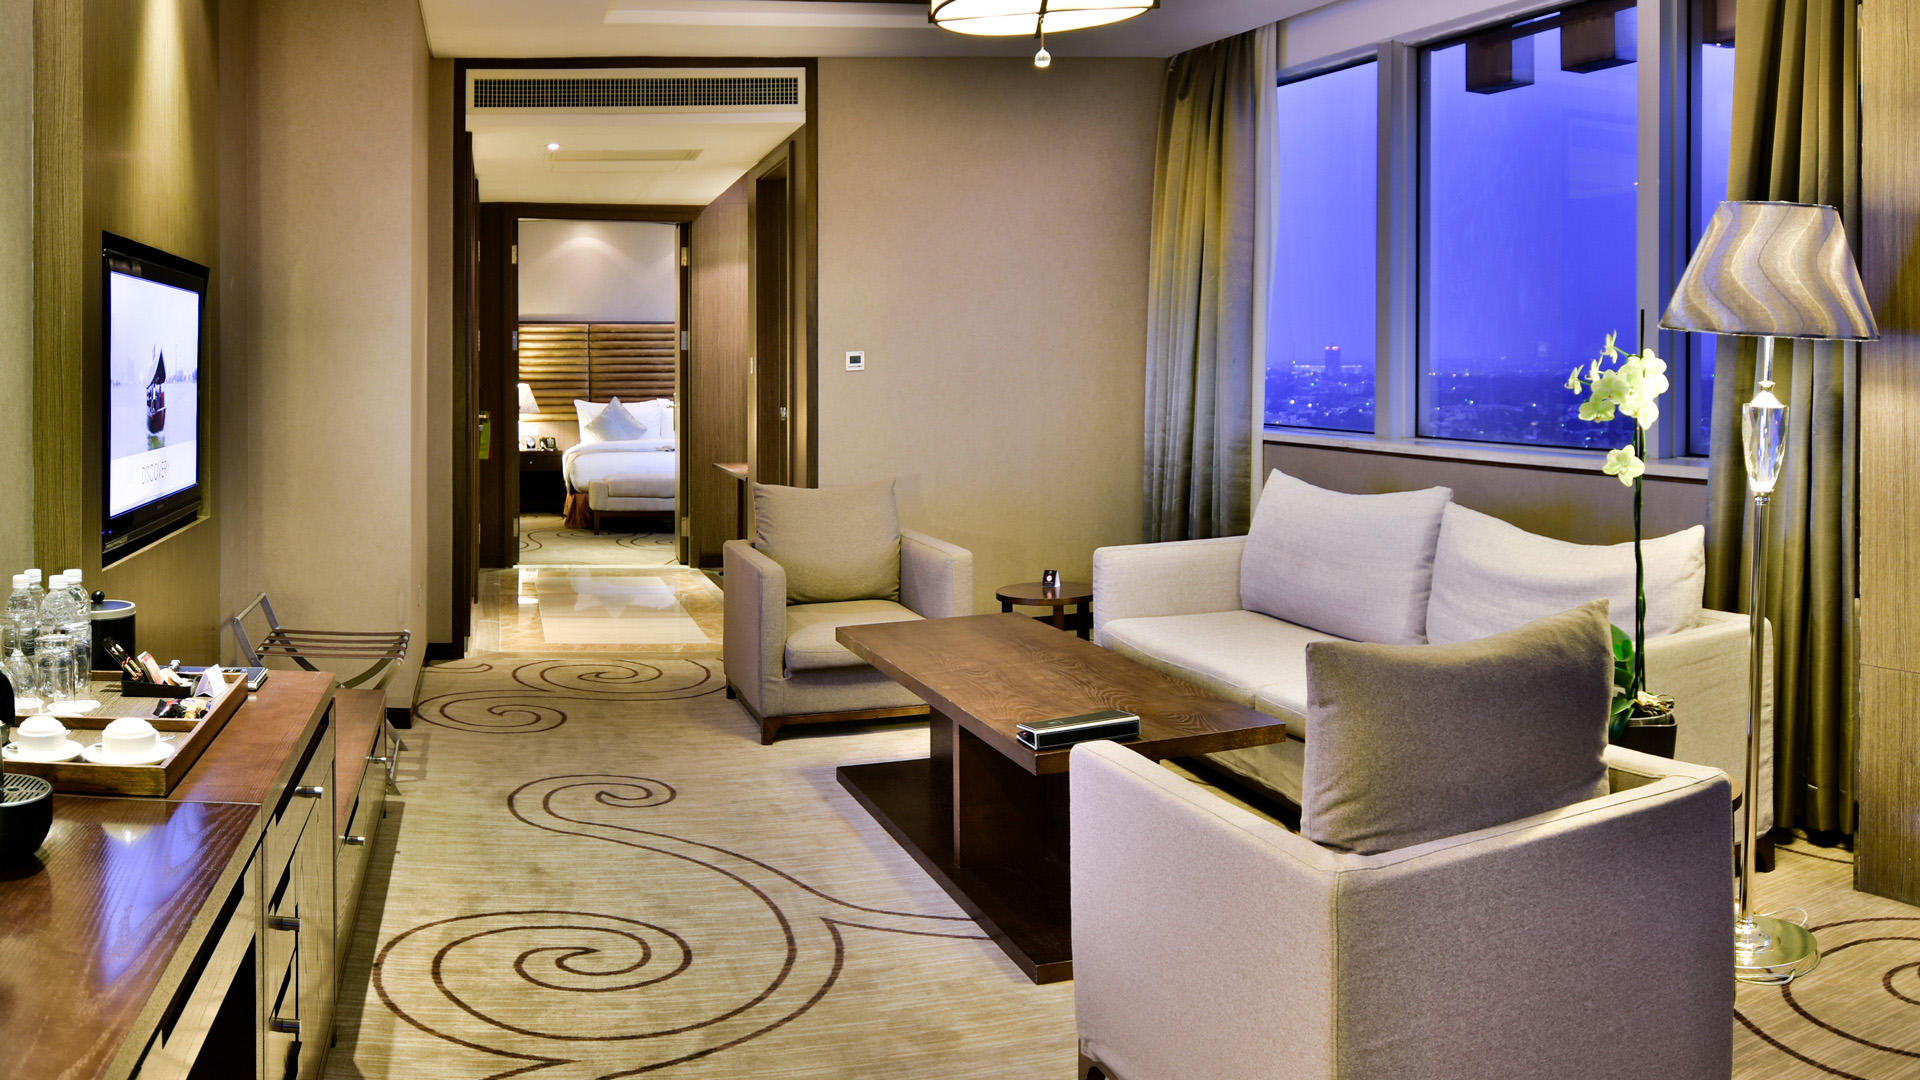 Accommodation at Fleuve Congo Hotel Hotel in Kinshasa